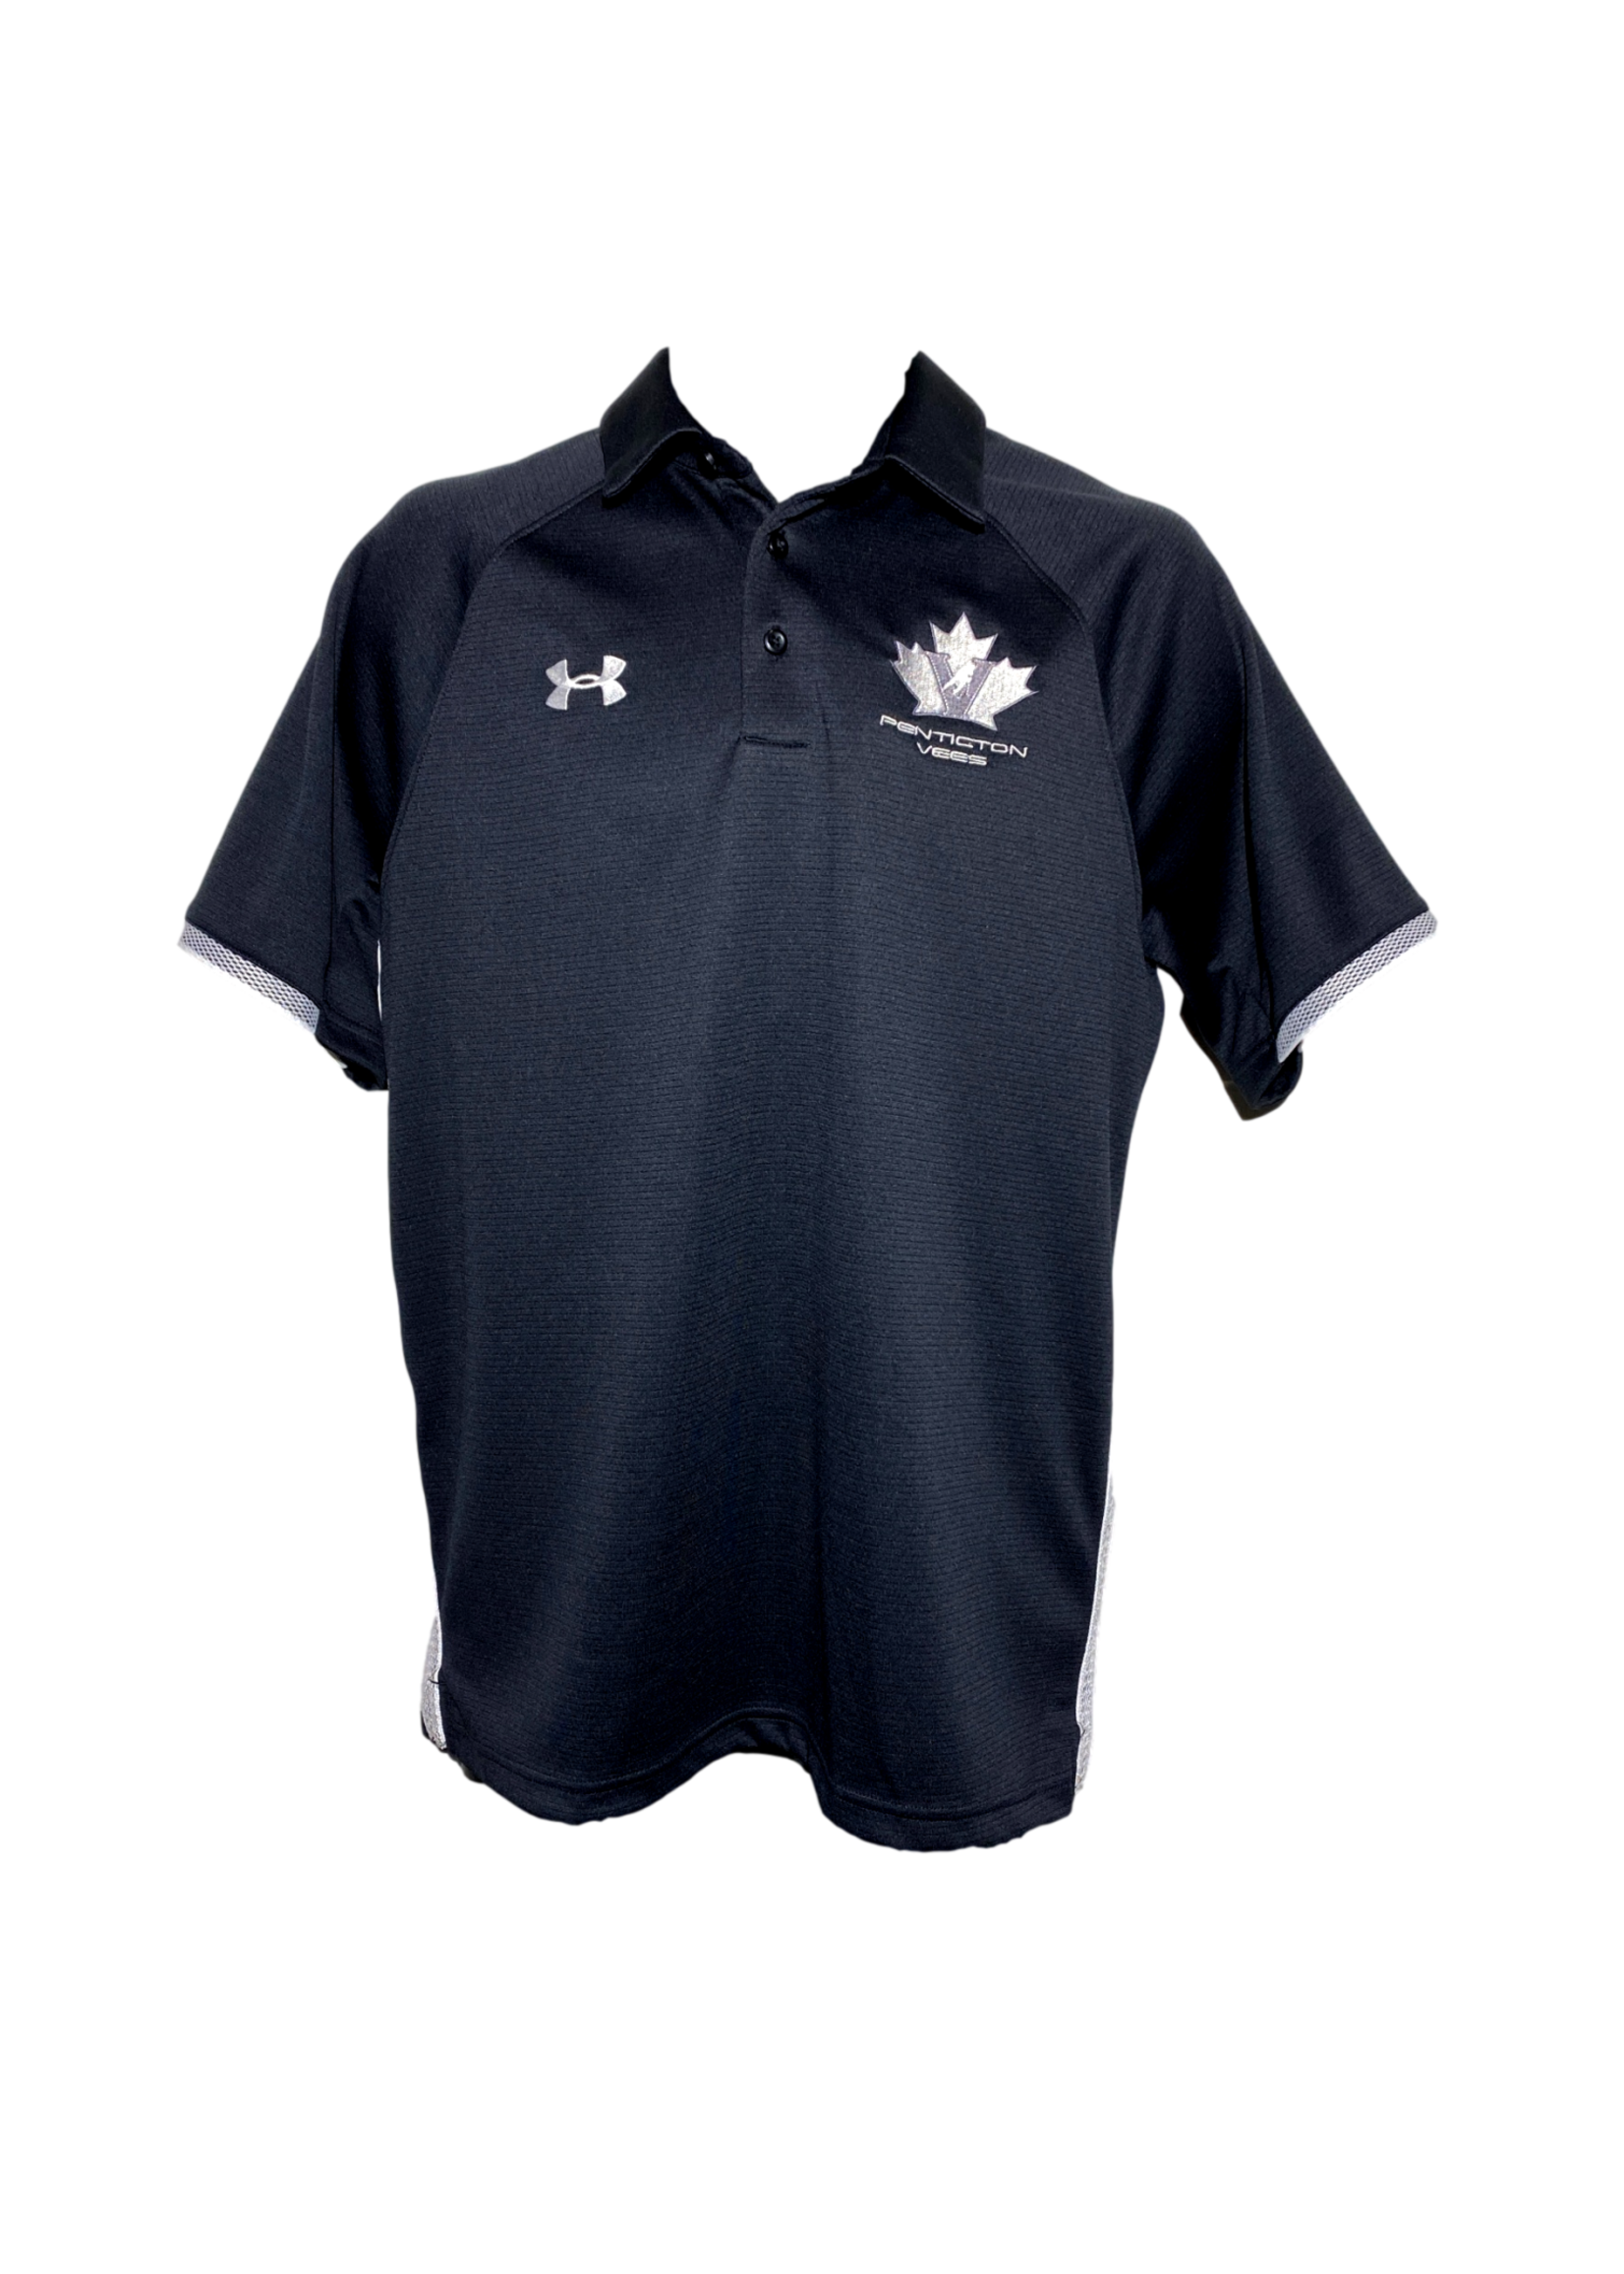 Under Armour Men's Under Armour Golf Shirt -Black